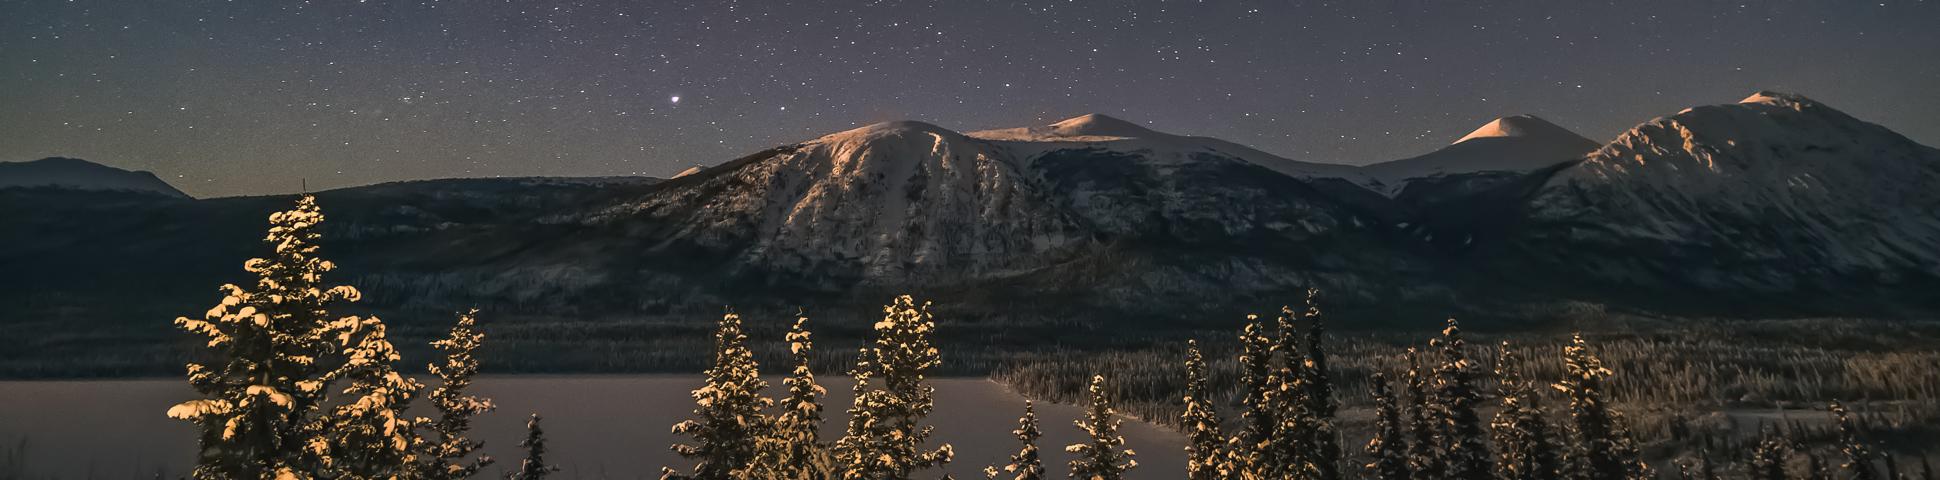 Panoramic view from Alaska and Yukon Adventure Tour